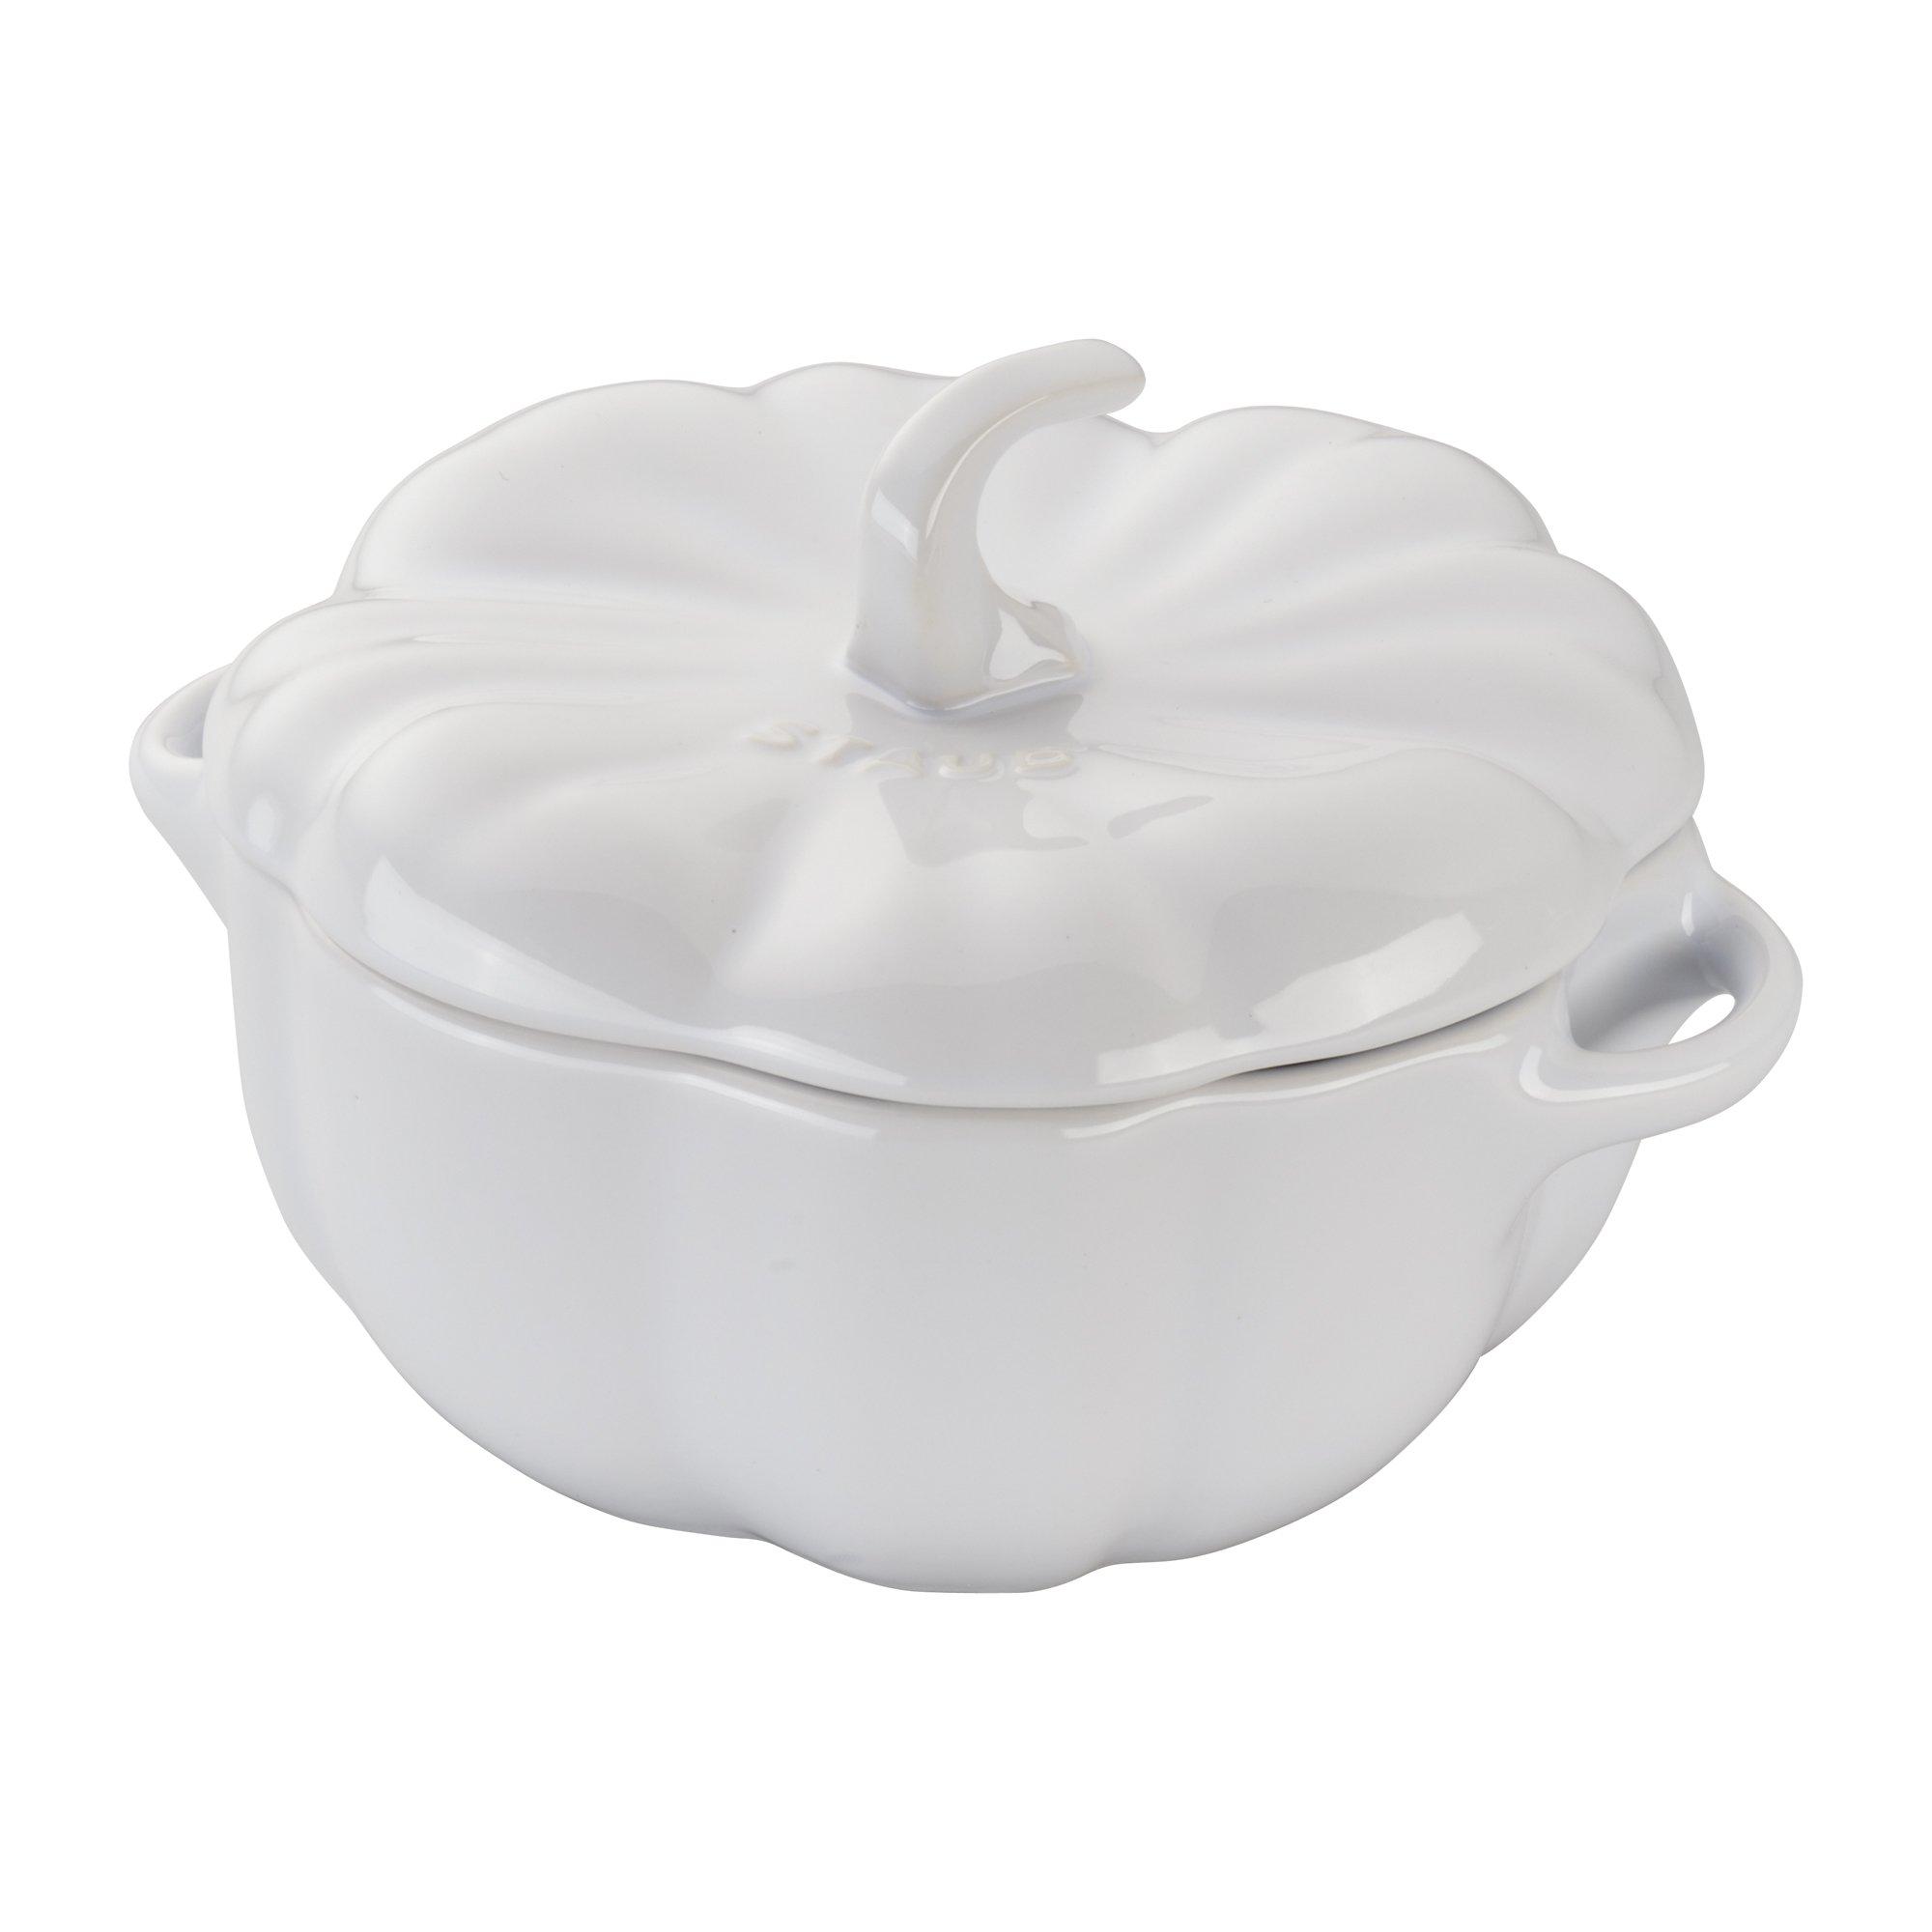 Staub 40508-560 Ceramics Pumpkin Cocotte, 24-oz, White